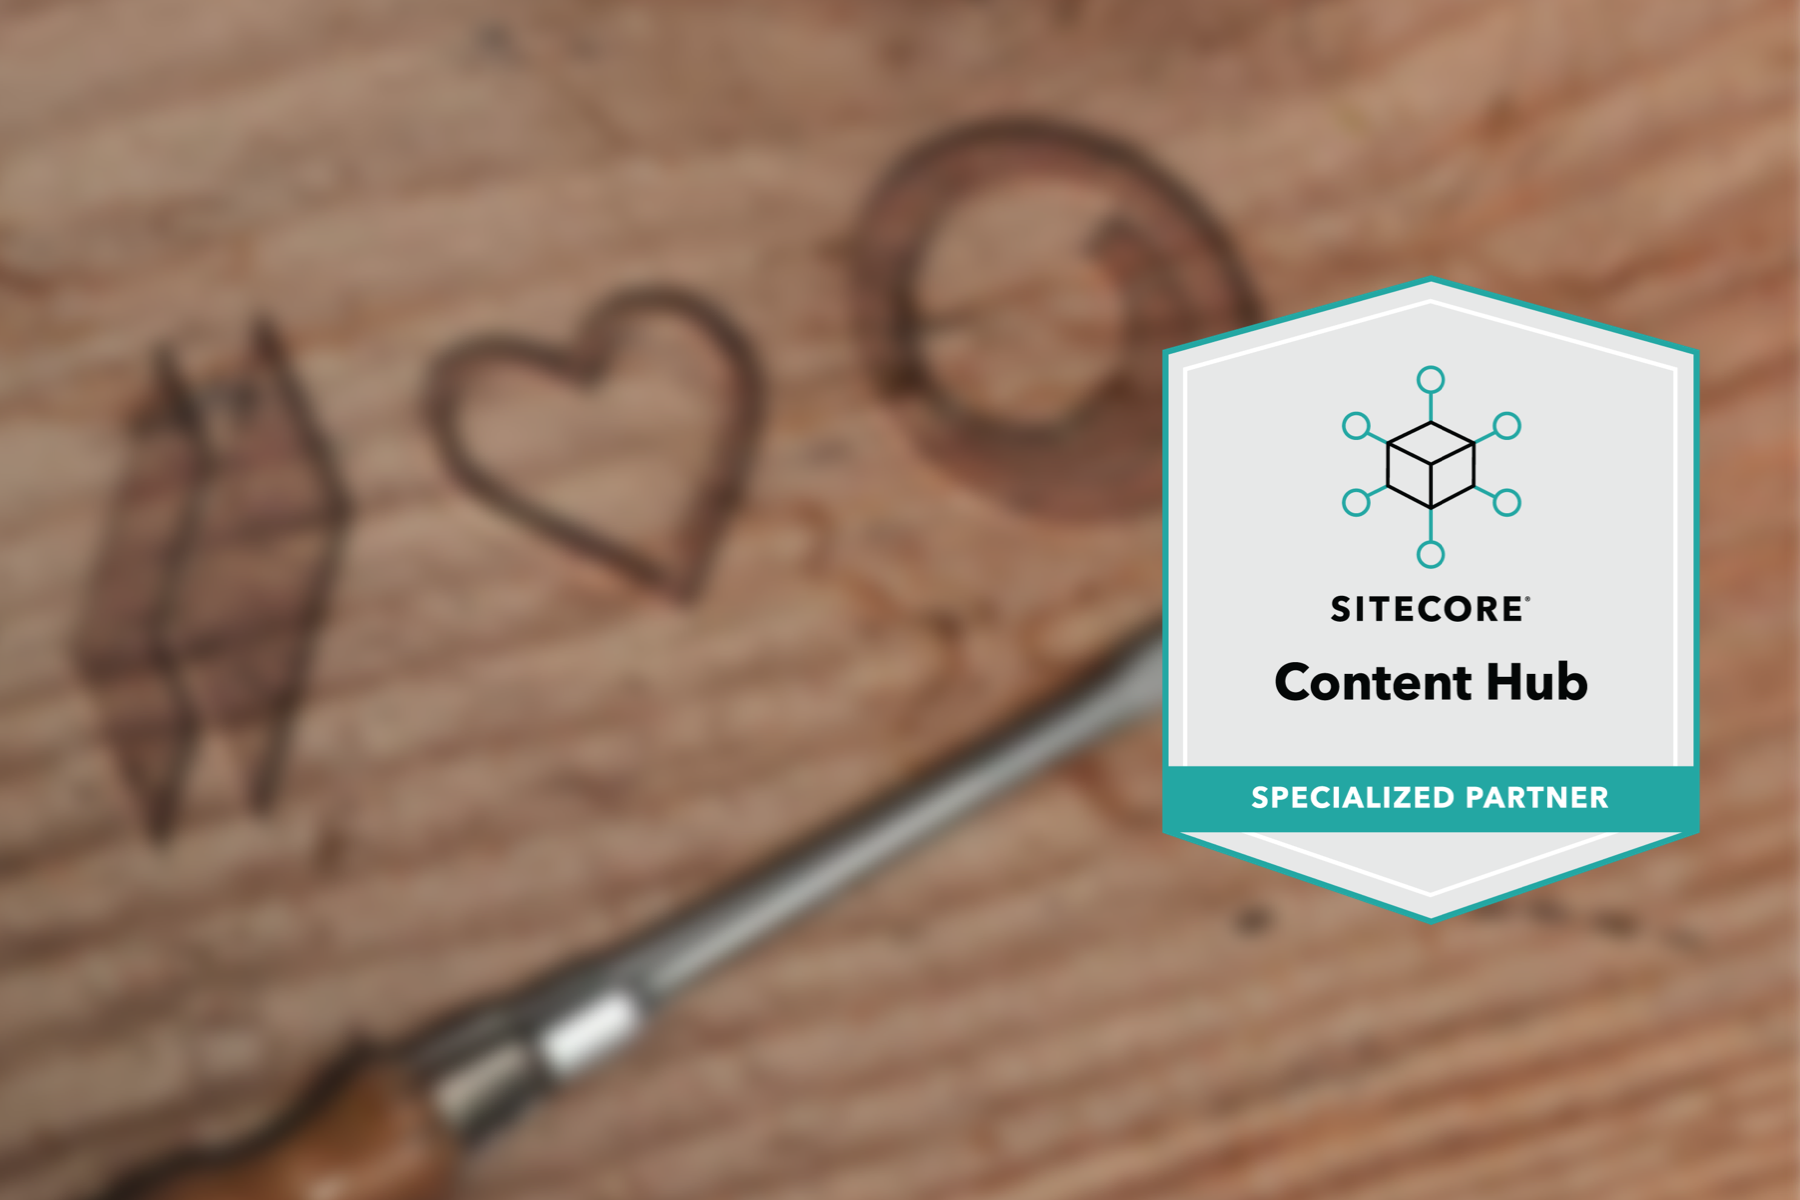 netzkern loves Sitecore Content Hub